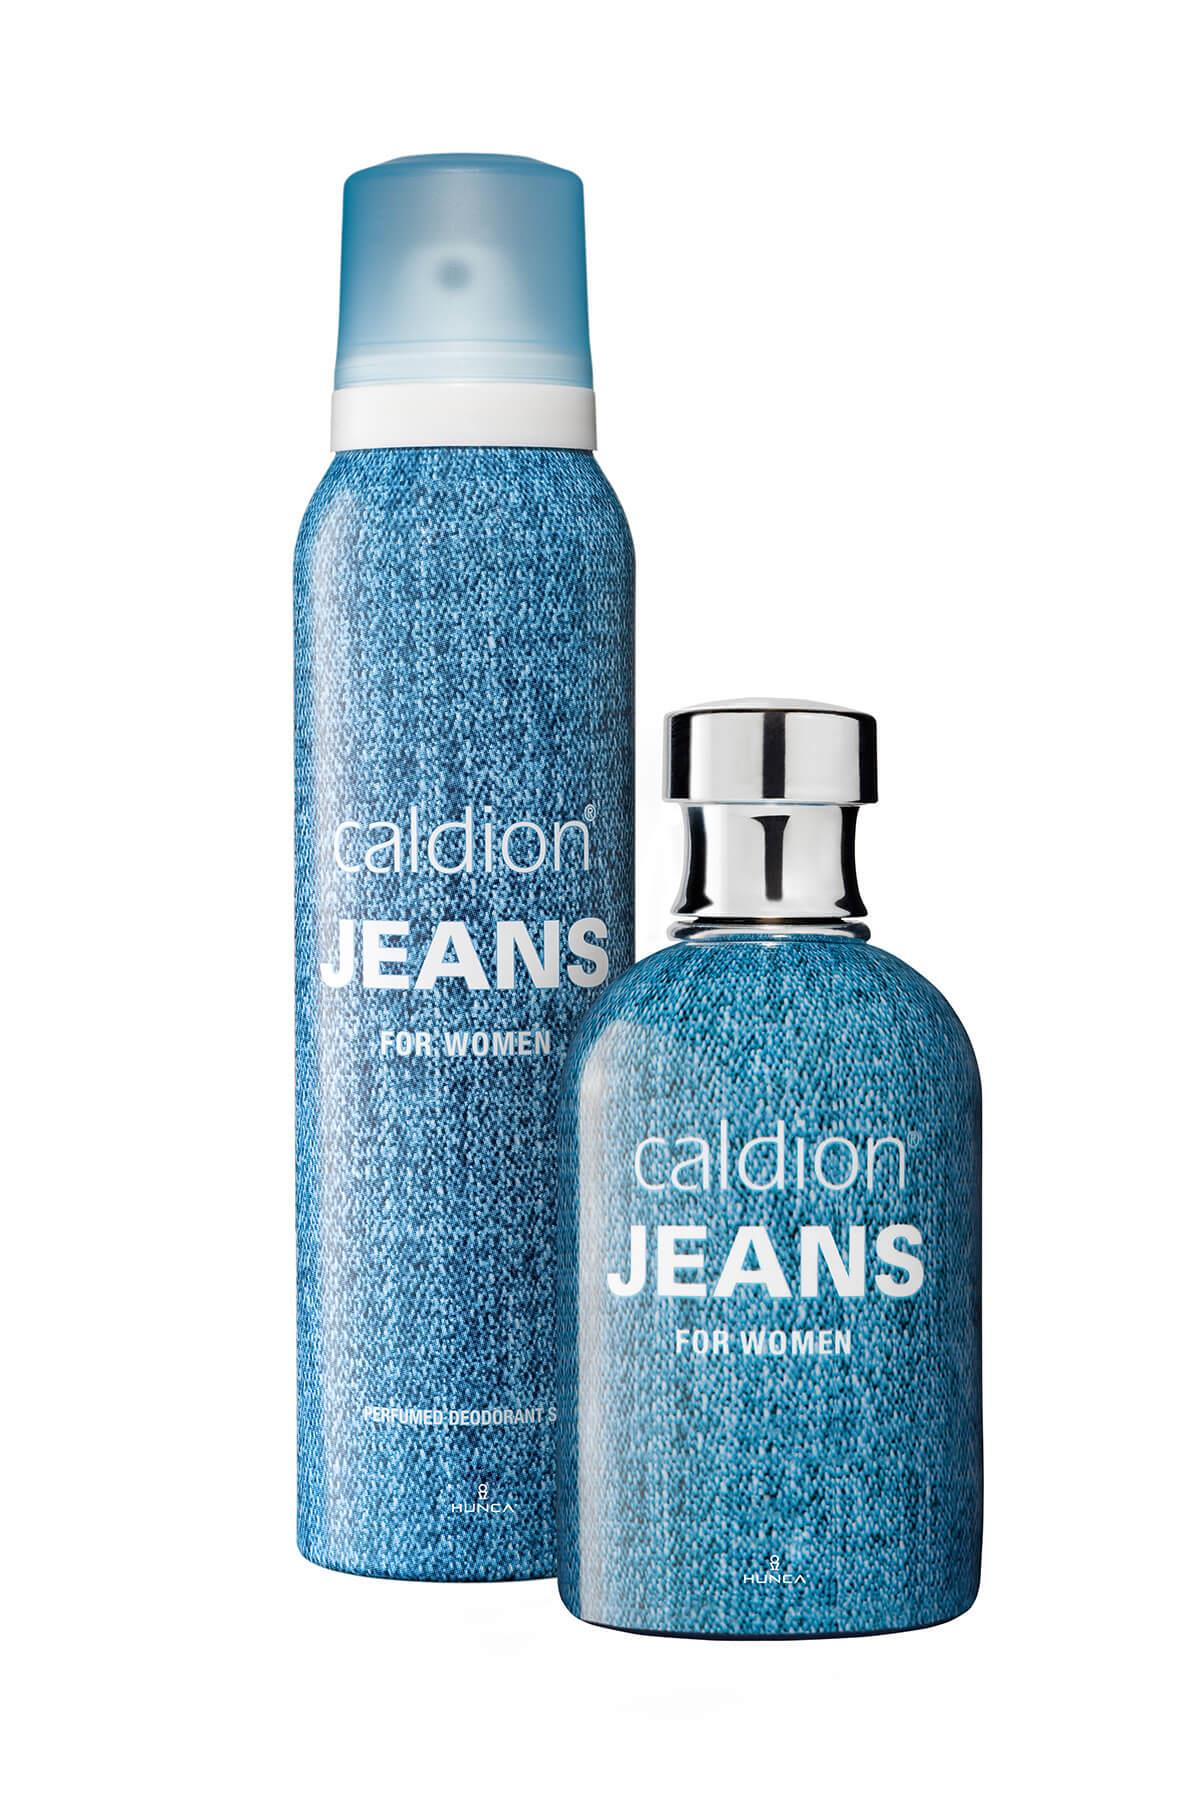 Caldion Jeans EDT 100 ml Kadın Parfüm Seti